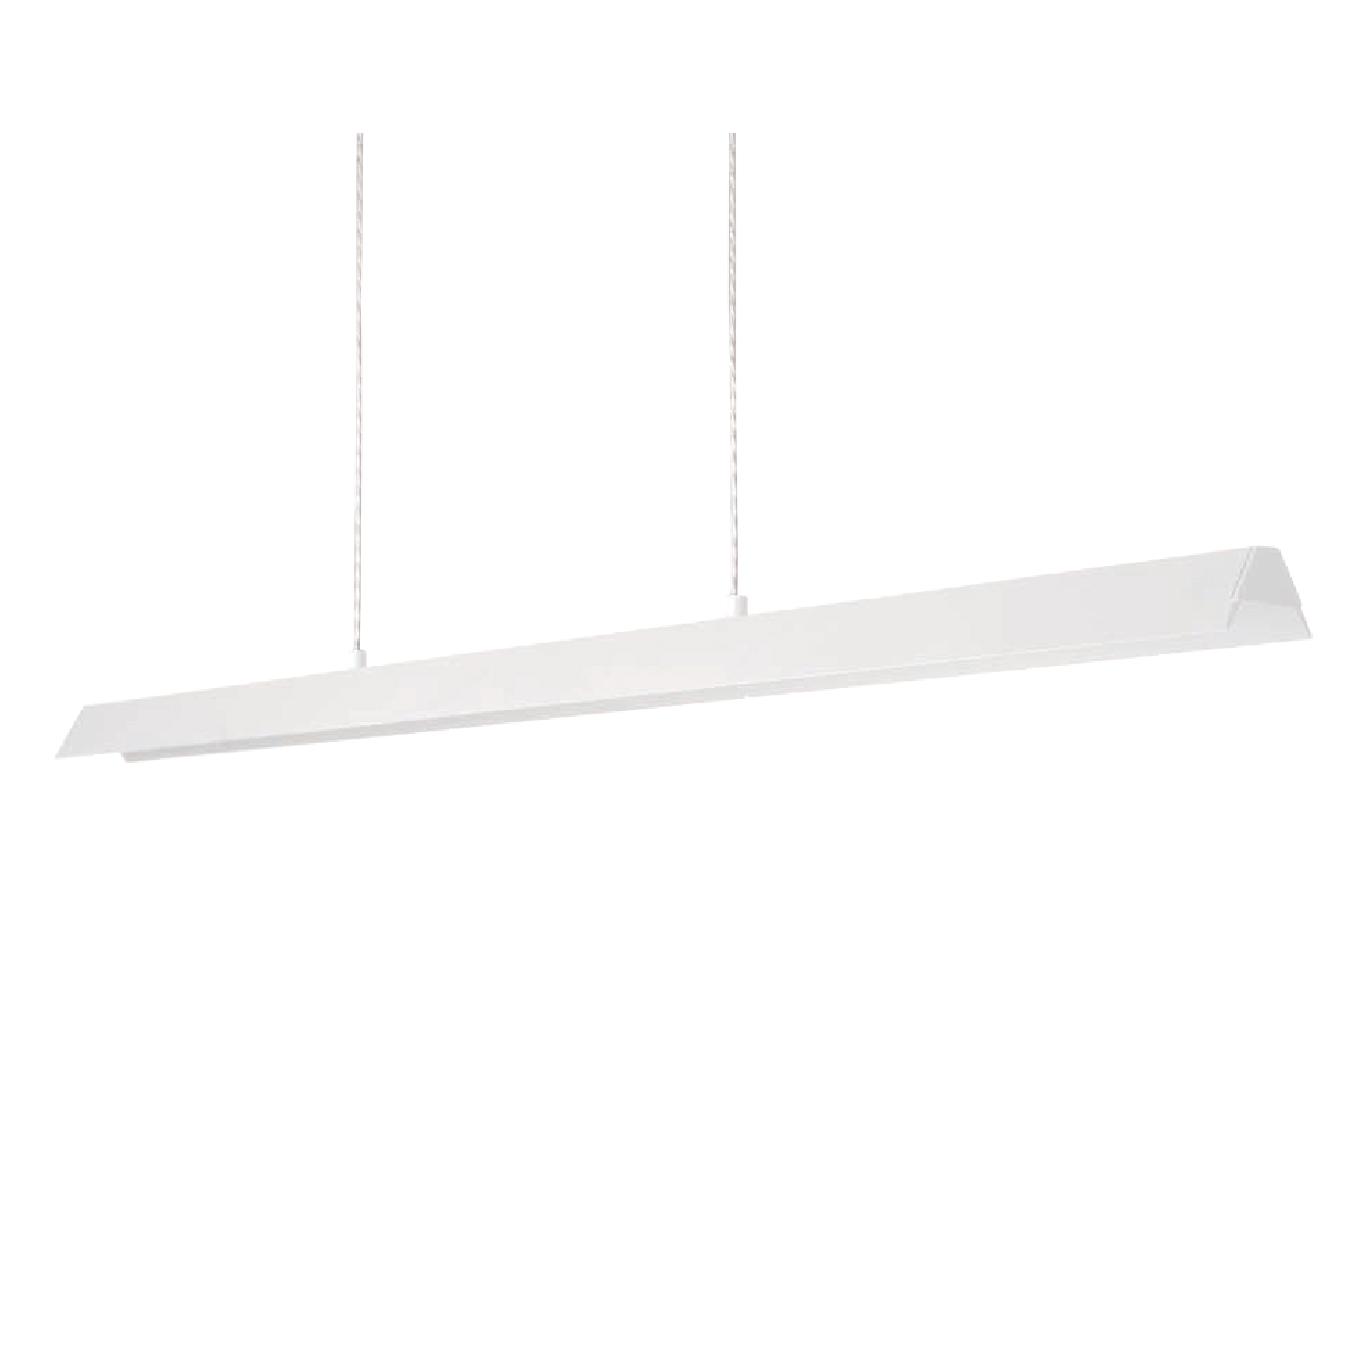 c1ec30ffa1c Alcon Lighting 12132 Linear Trapezium 4 Foot LED Pendant Mount Lighting  Fixture